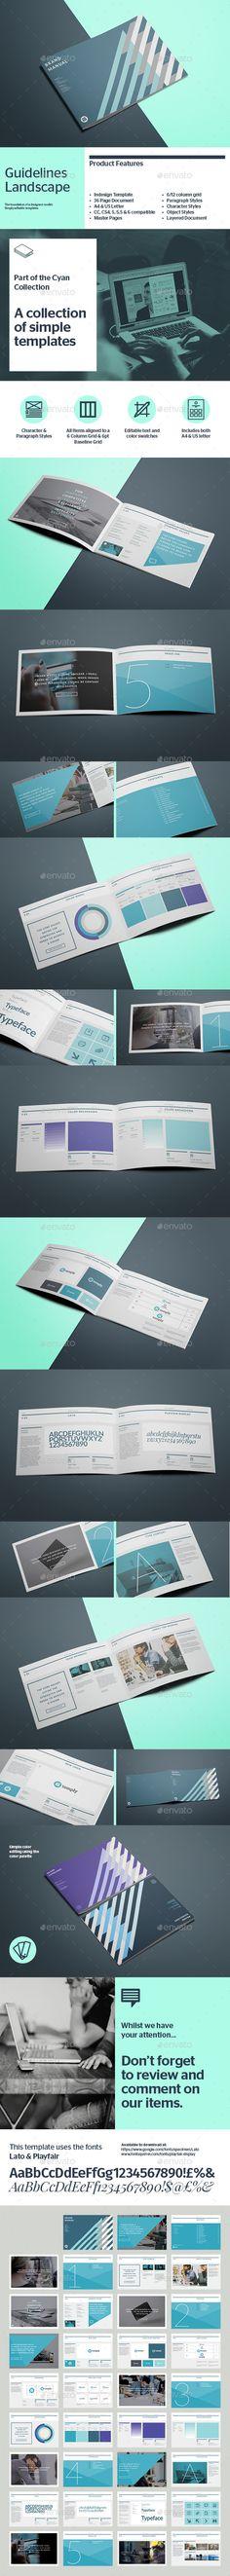 Brand Manual Brochures, Templates and Manual - operating manual template